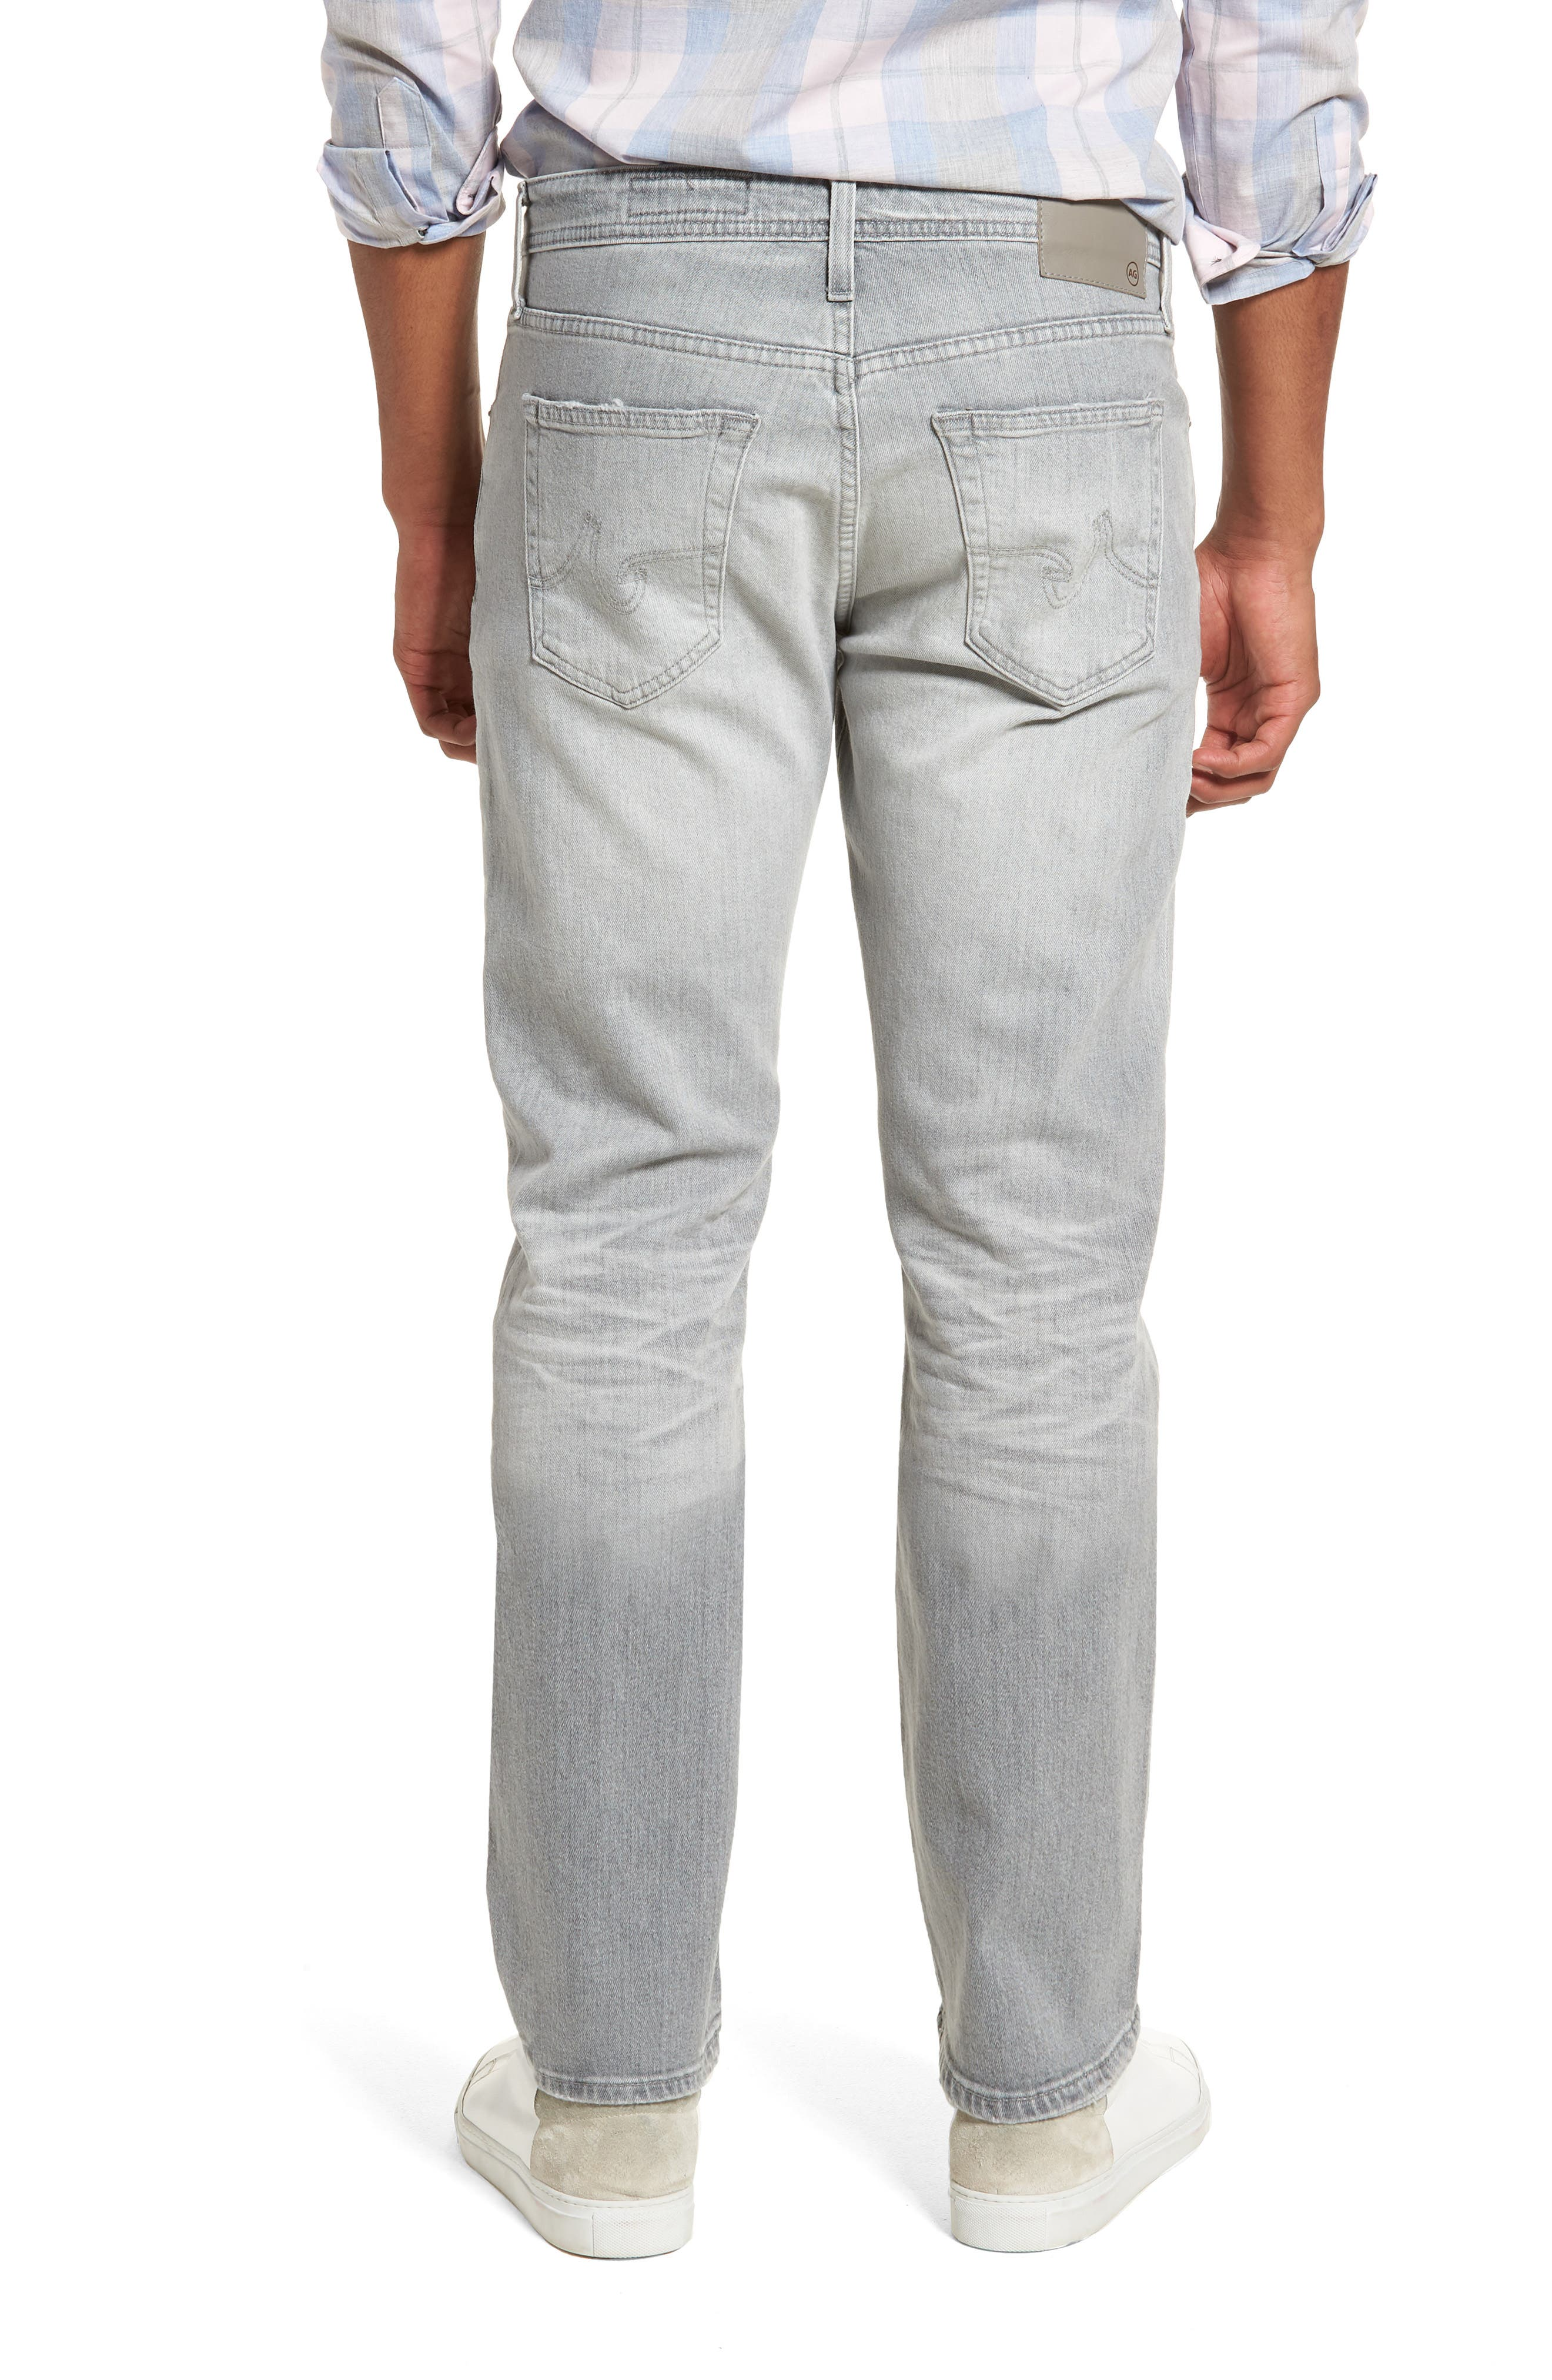 Graduate Slim Straight Leg Jeans,                             Alternate thumbnail 2, color,                             21 Years Outline